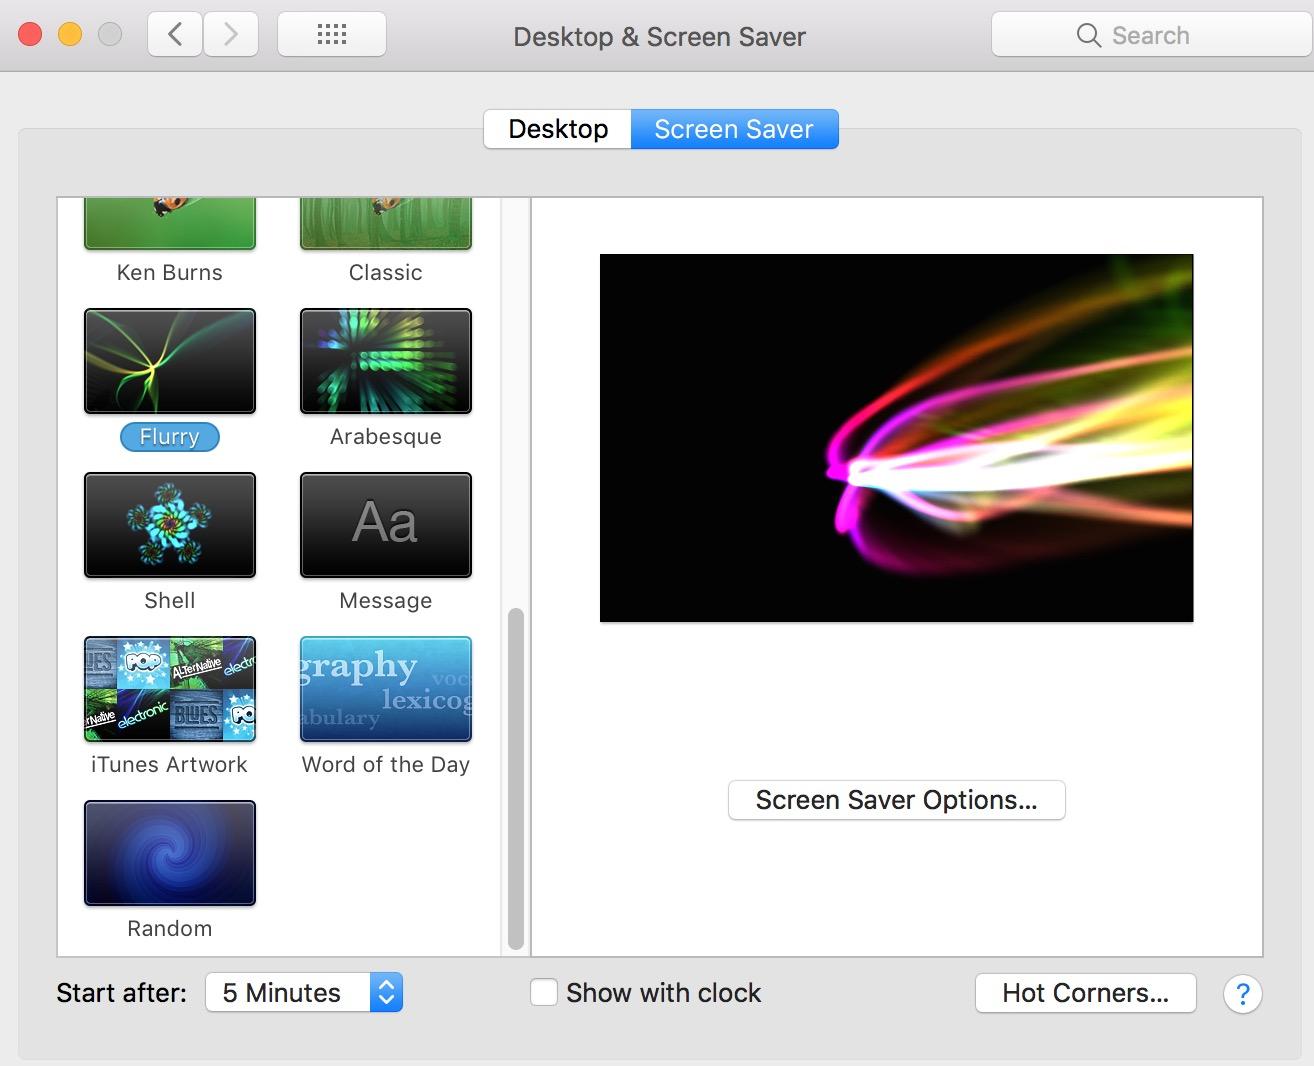 Desktop & Screen Saver Preferences showing macOS screensavers